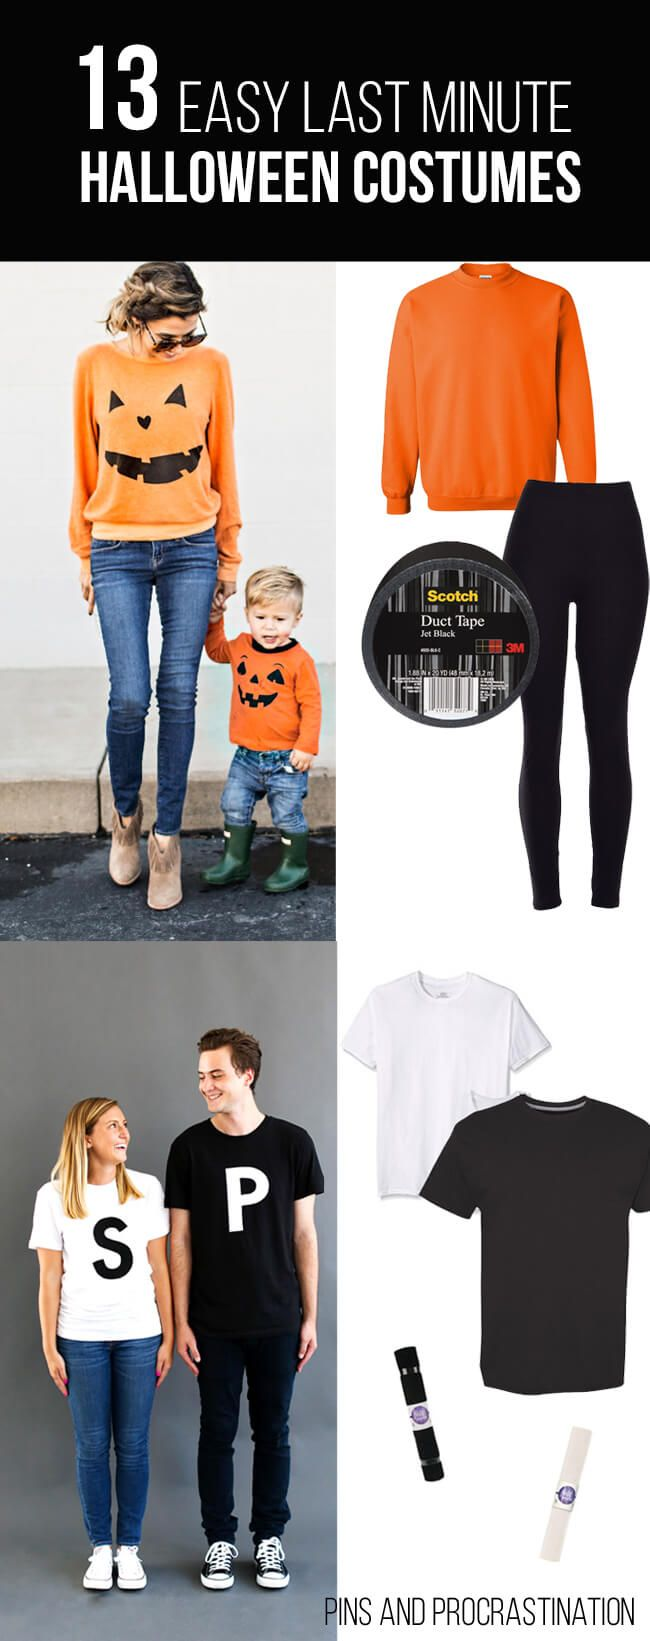 13 easy last minute diy halloween costumes - Last Minute Halloween Decorations